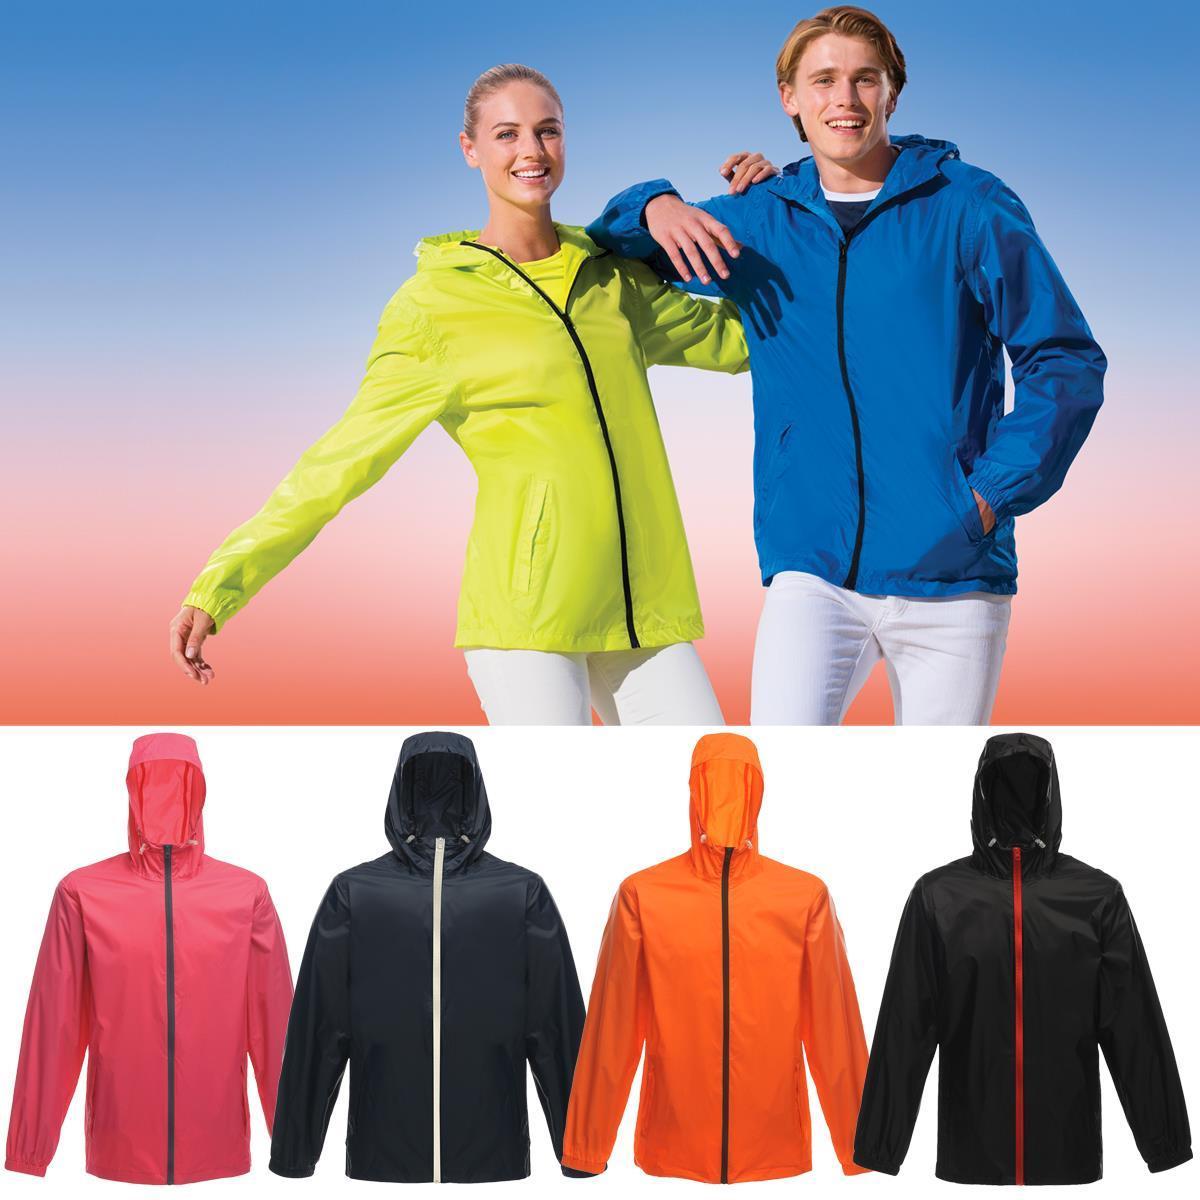 Regatta Avant Unisex Waterproof Lined RainShell Jacket Taped Seams Mesh Lining